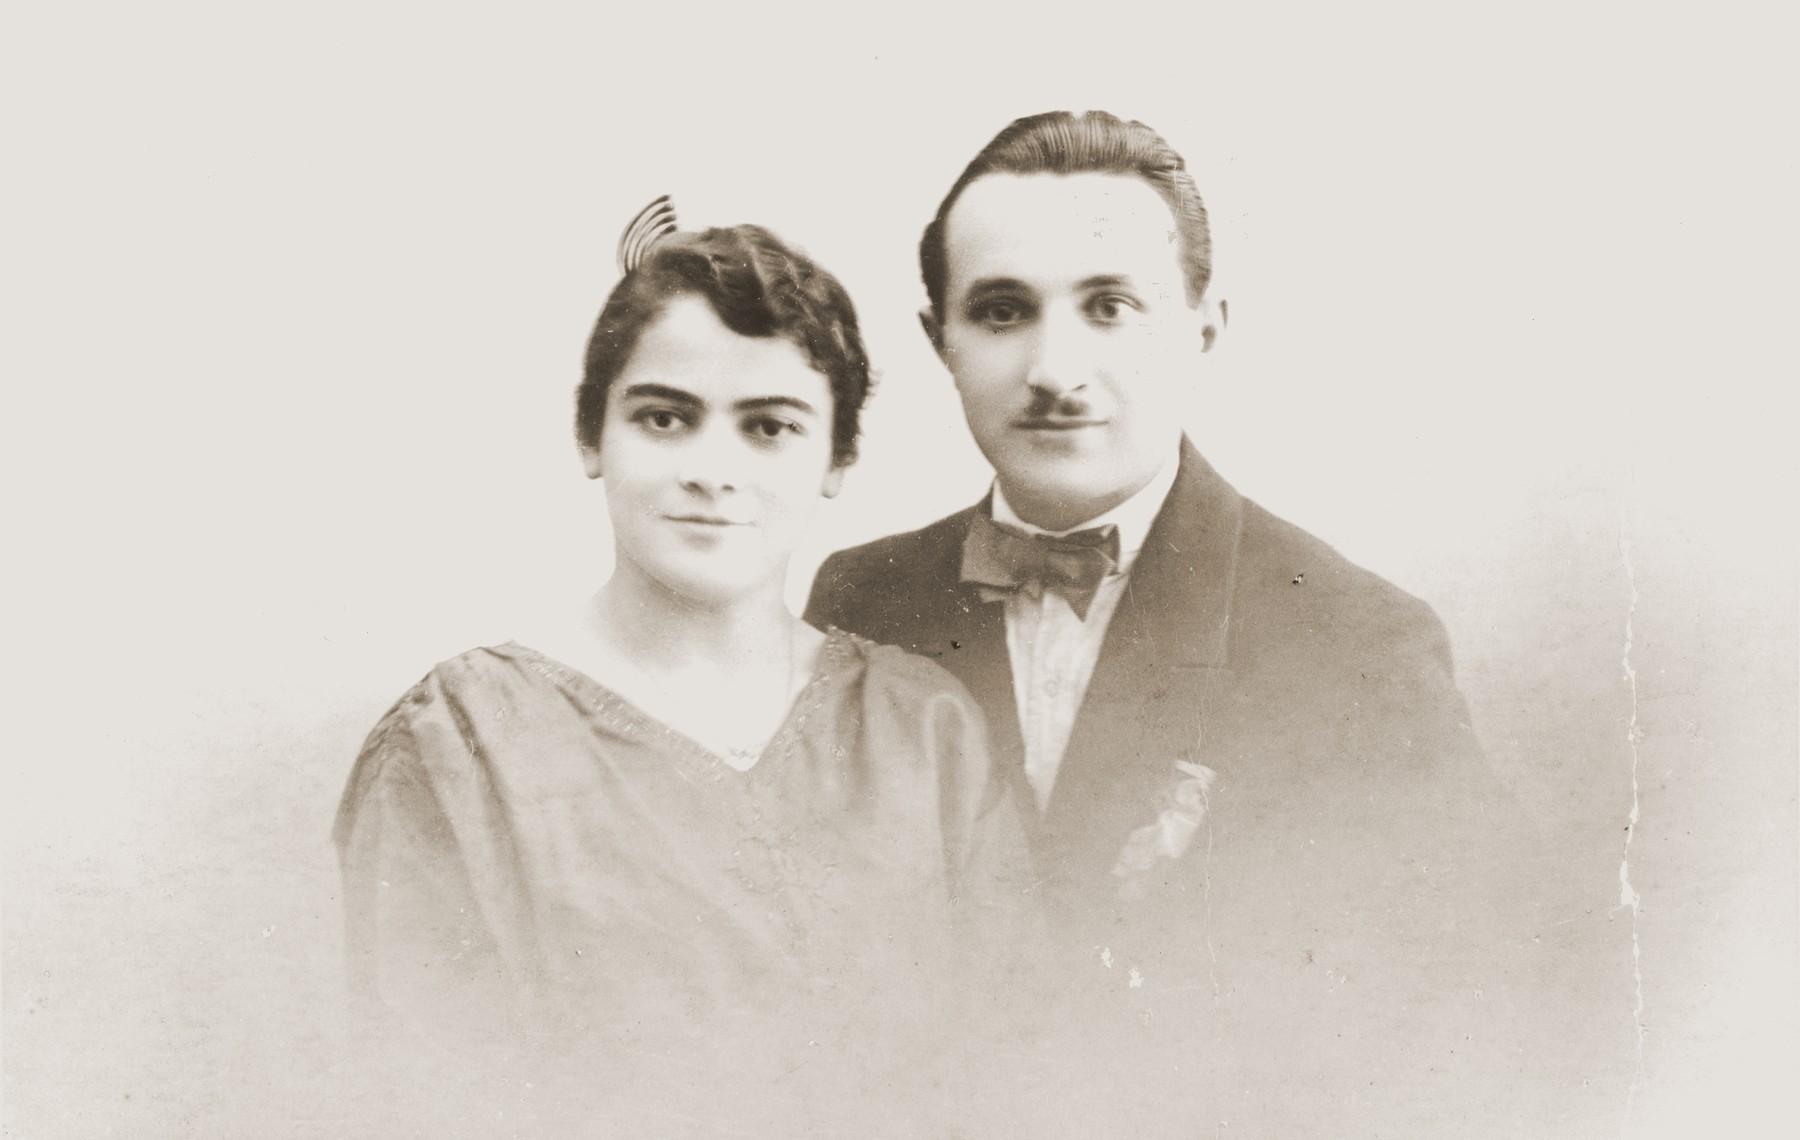 Pola Danishevska and Benny Fil.